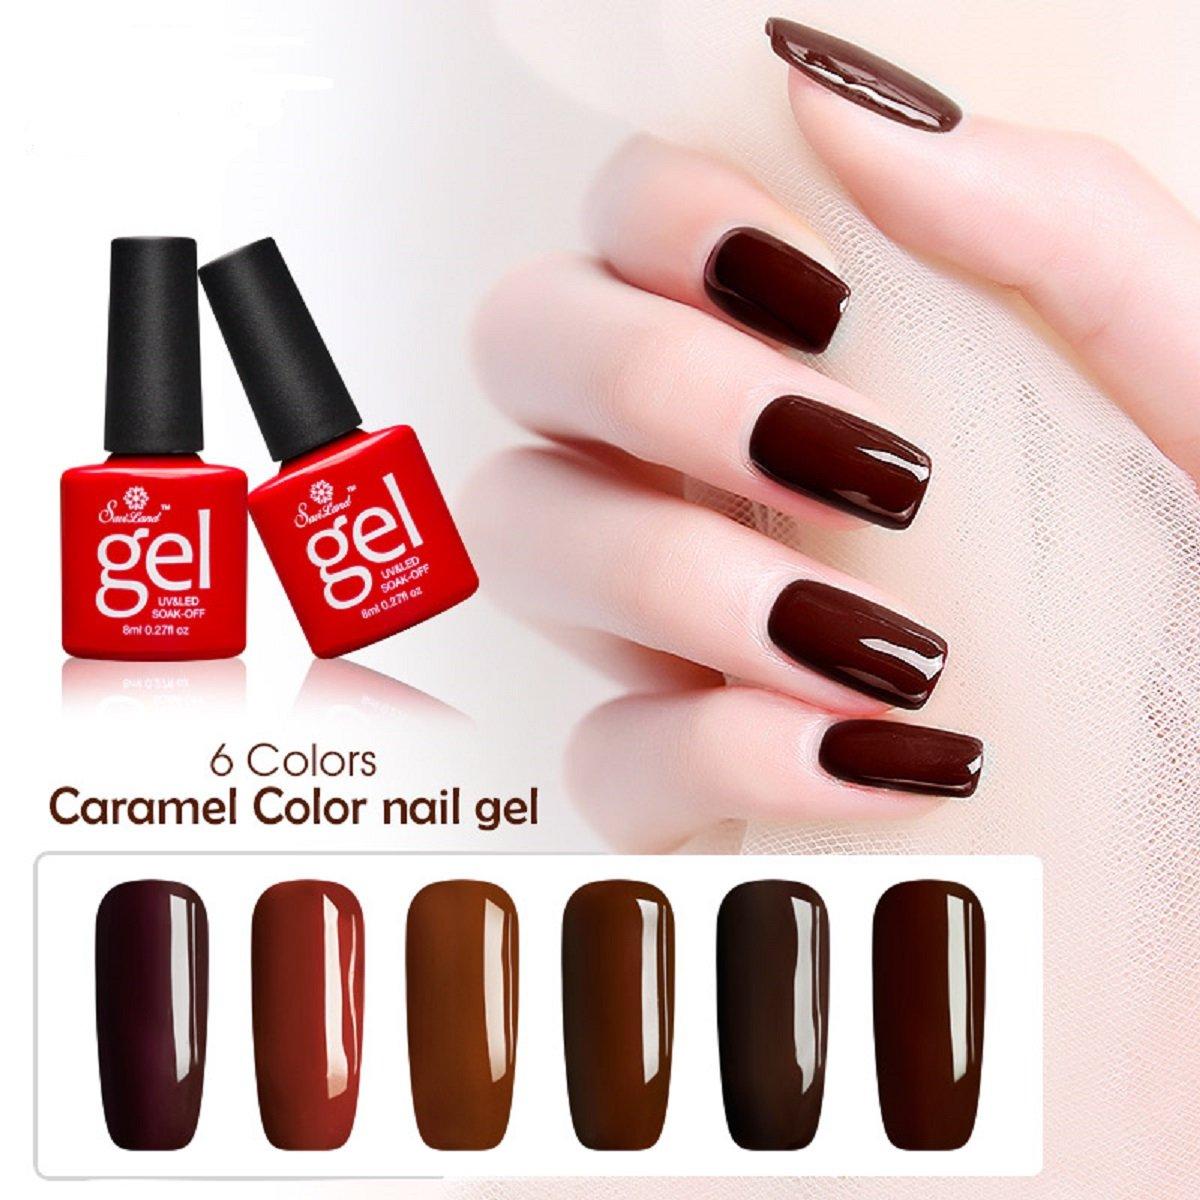 Soak off Gel Nail Polish Sets, Saviland 6 Pcs UV Nail Varnish Set DIY Nail Art Starter Manicure Kit 8ml(Caramel Brown colour)